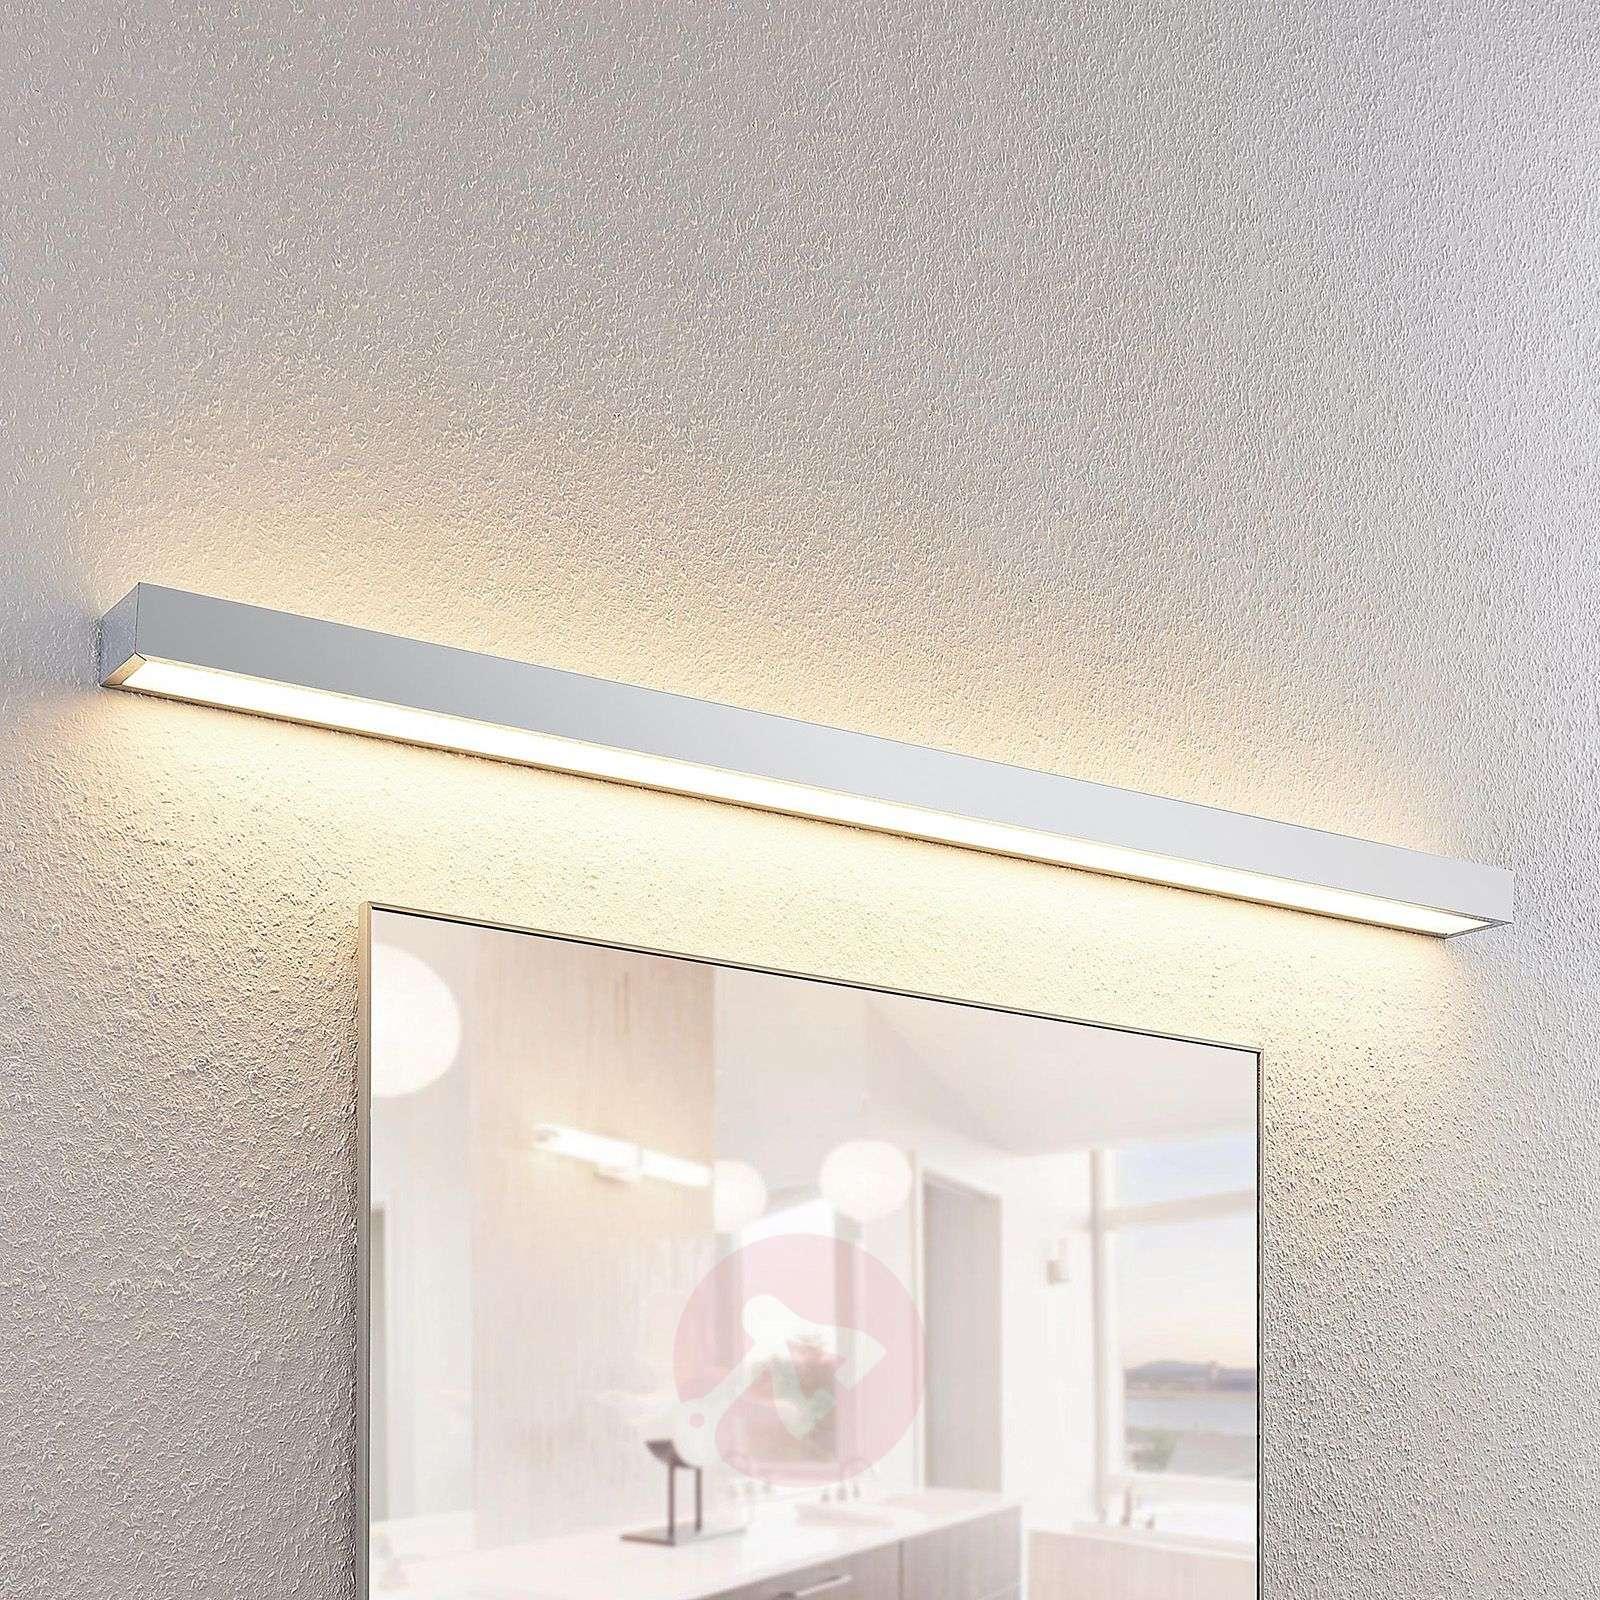 Lindby Layan LED-kylpyhuonevalaisin, kromi, 120 cm-9641112-02